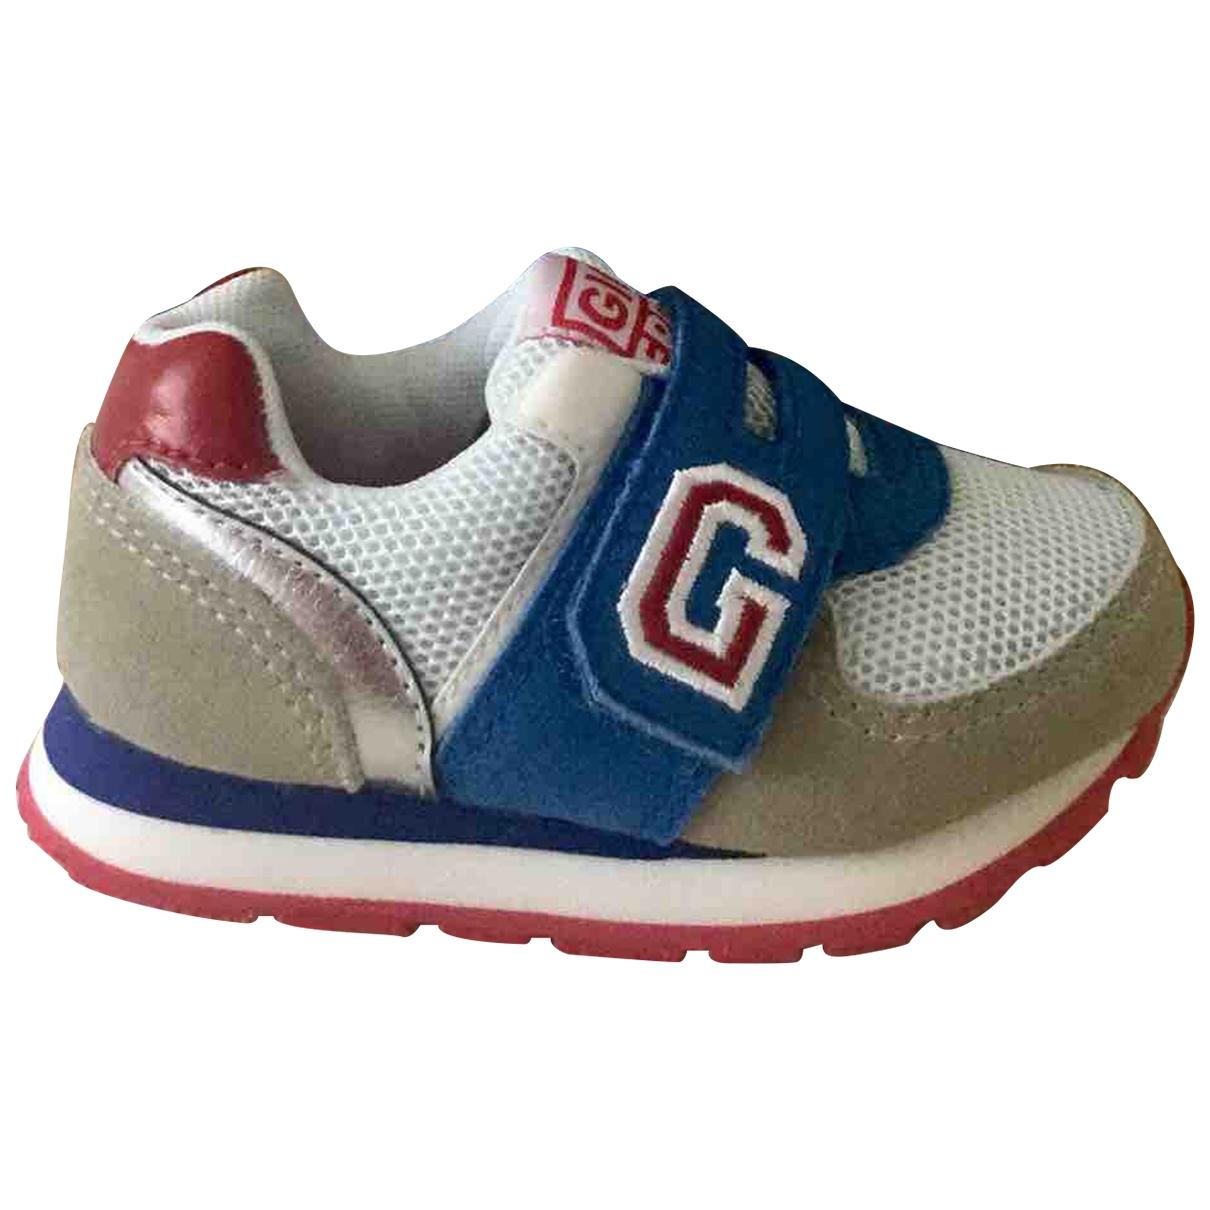 Gioseppo \N Sneakers in  Bunt Leder